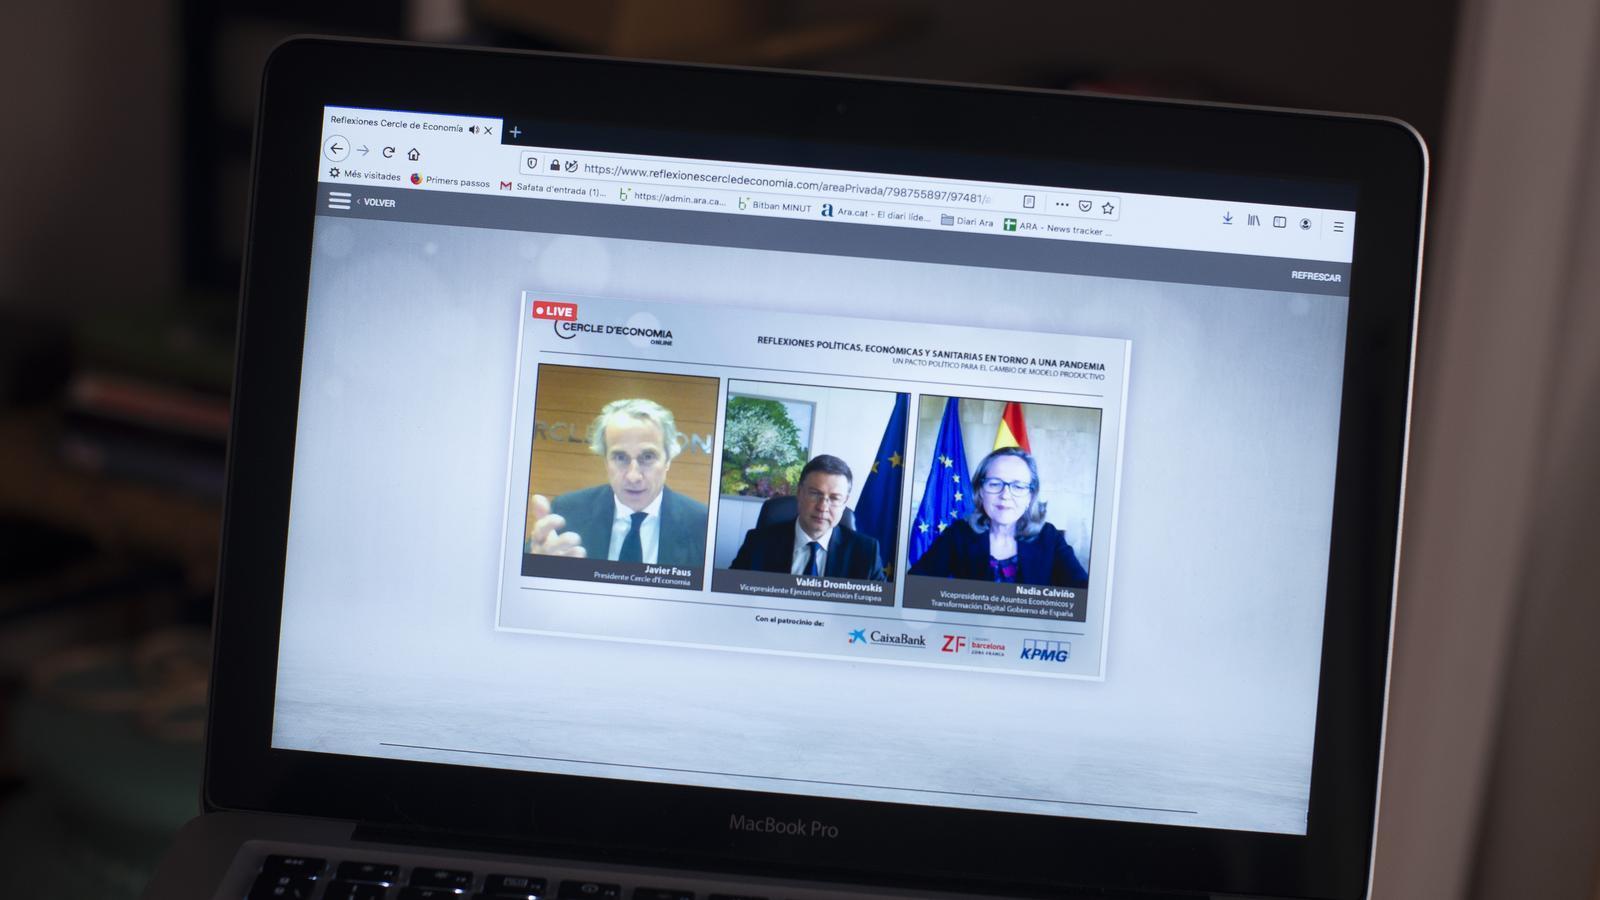 Imatge de la trobada virtual del Cercle d'Economia, amb Javier Faus, Valdiri Dombrovskis i Nadia Calviño.